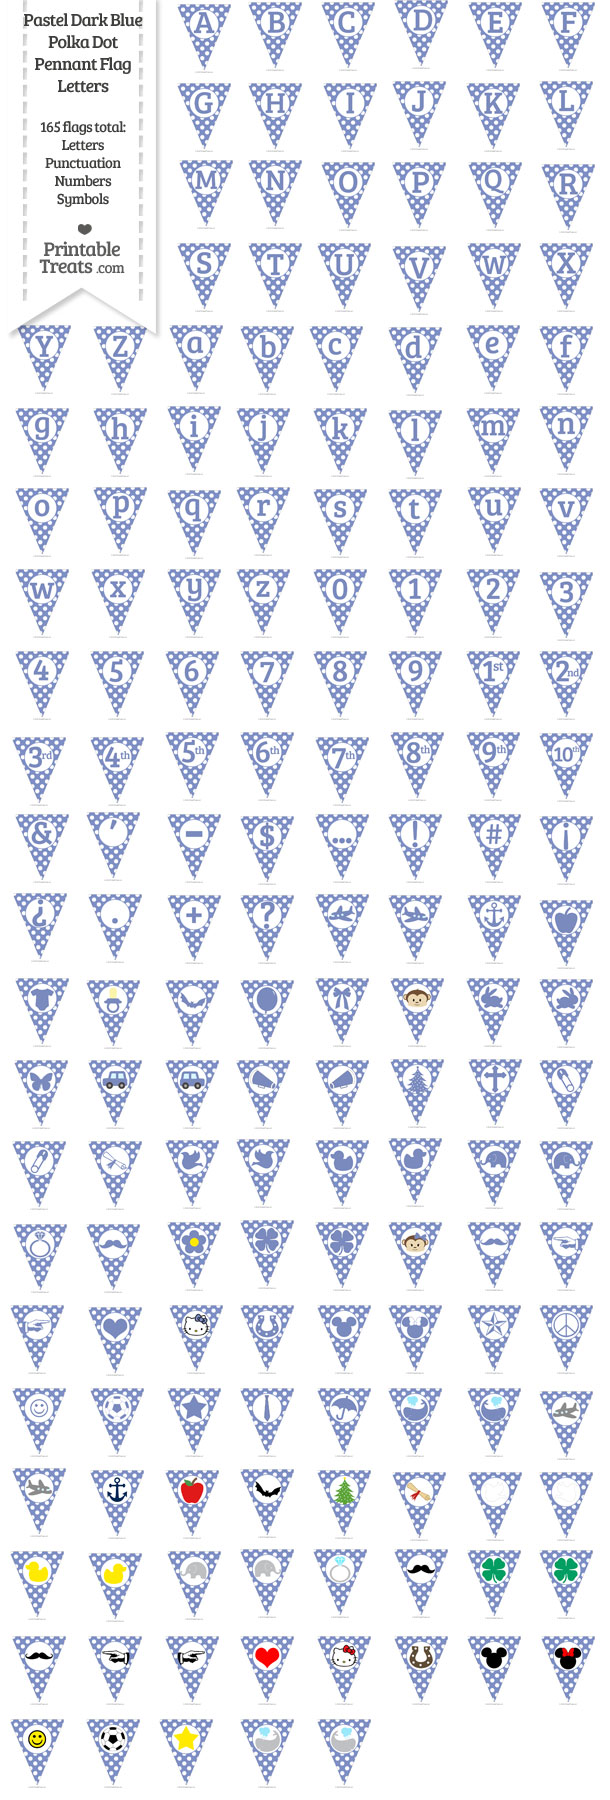 Pastel Dark Blue Polka Dot Pennant Flag Letters Download from PrintableTreats.com